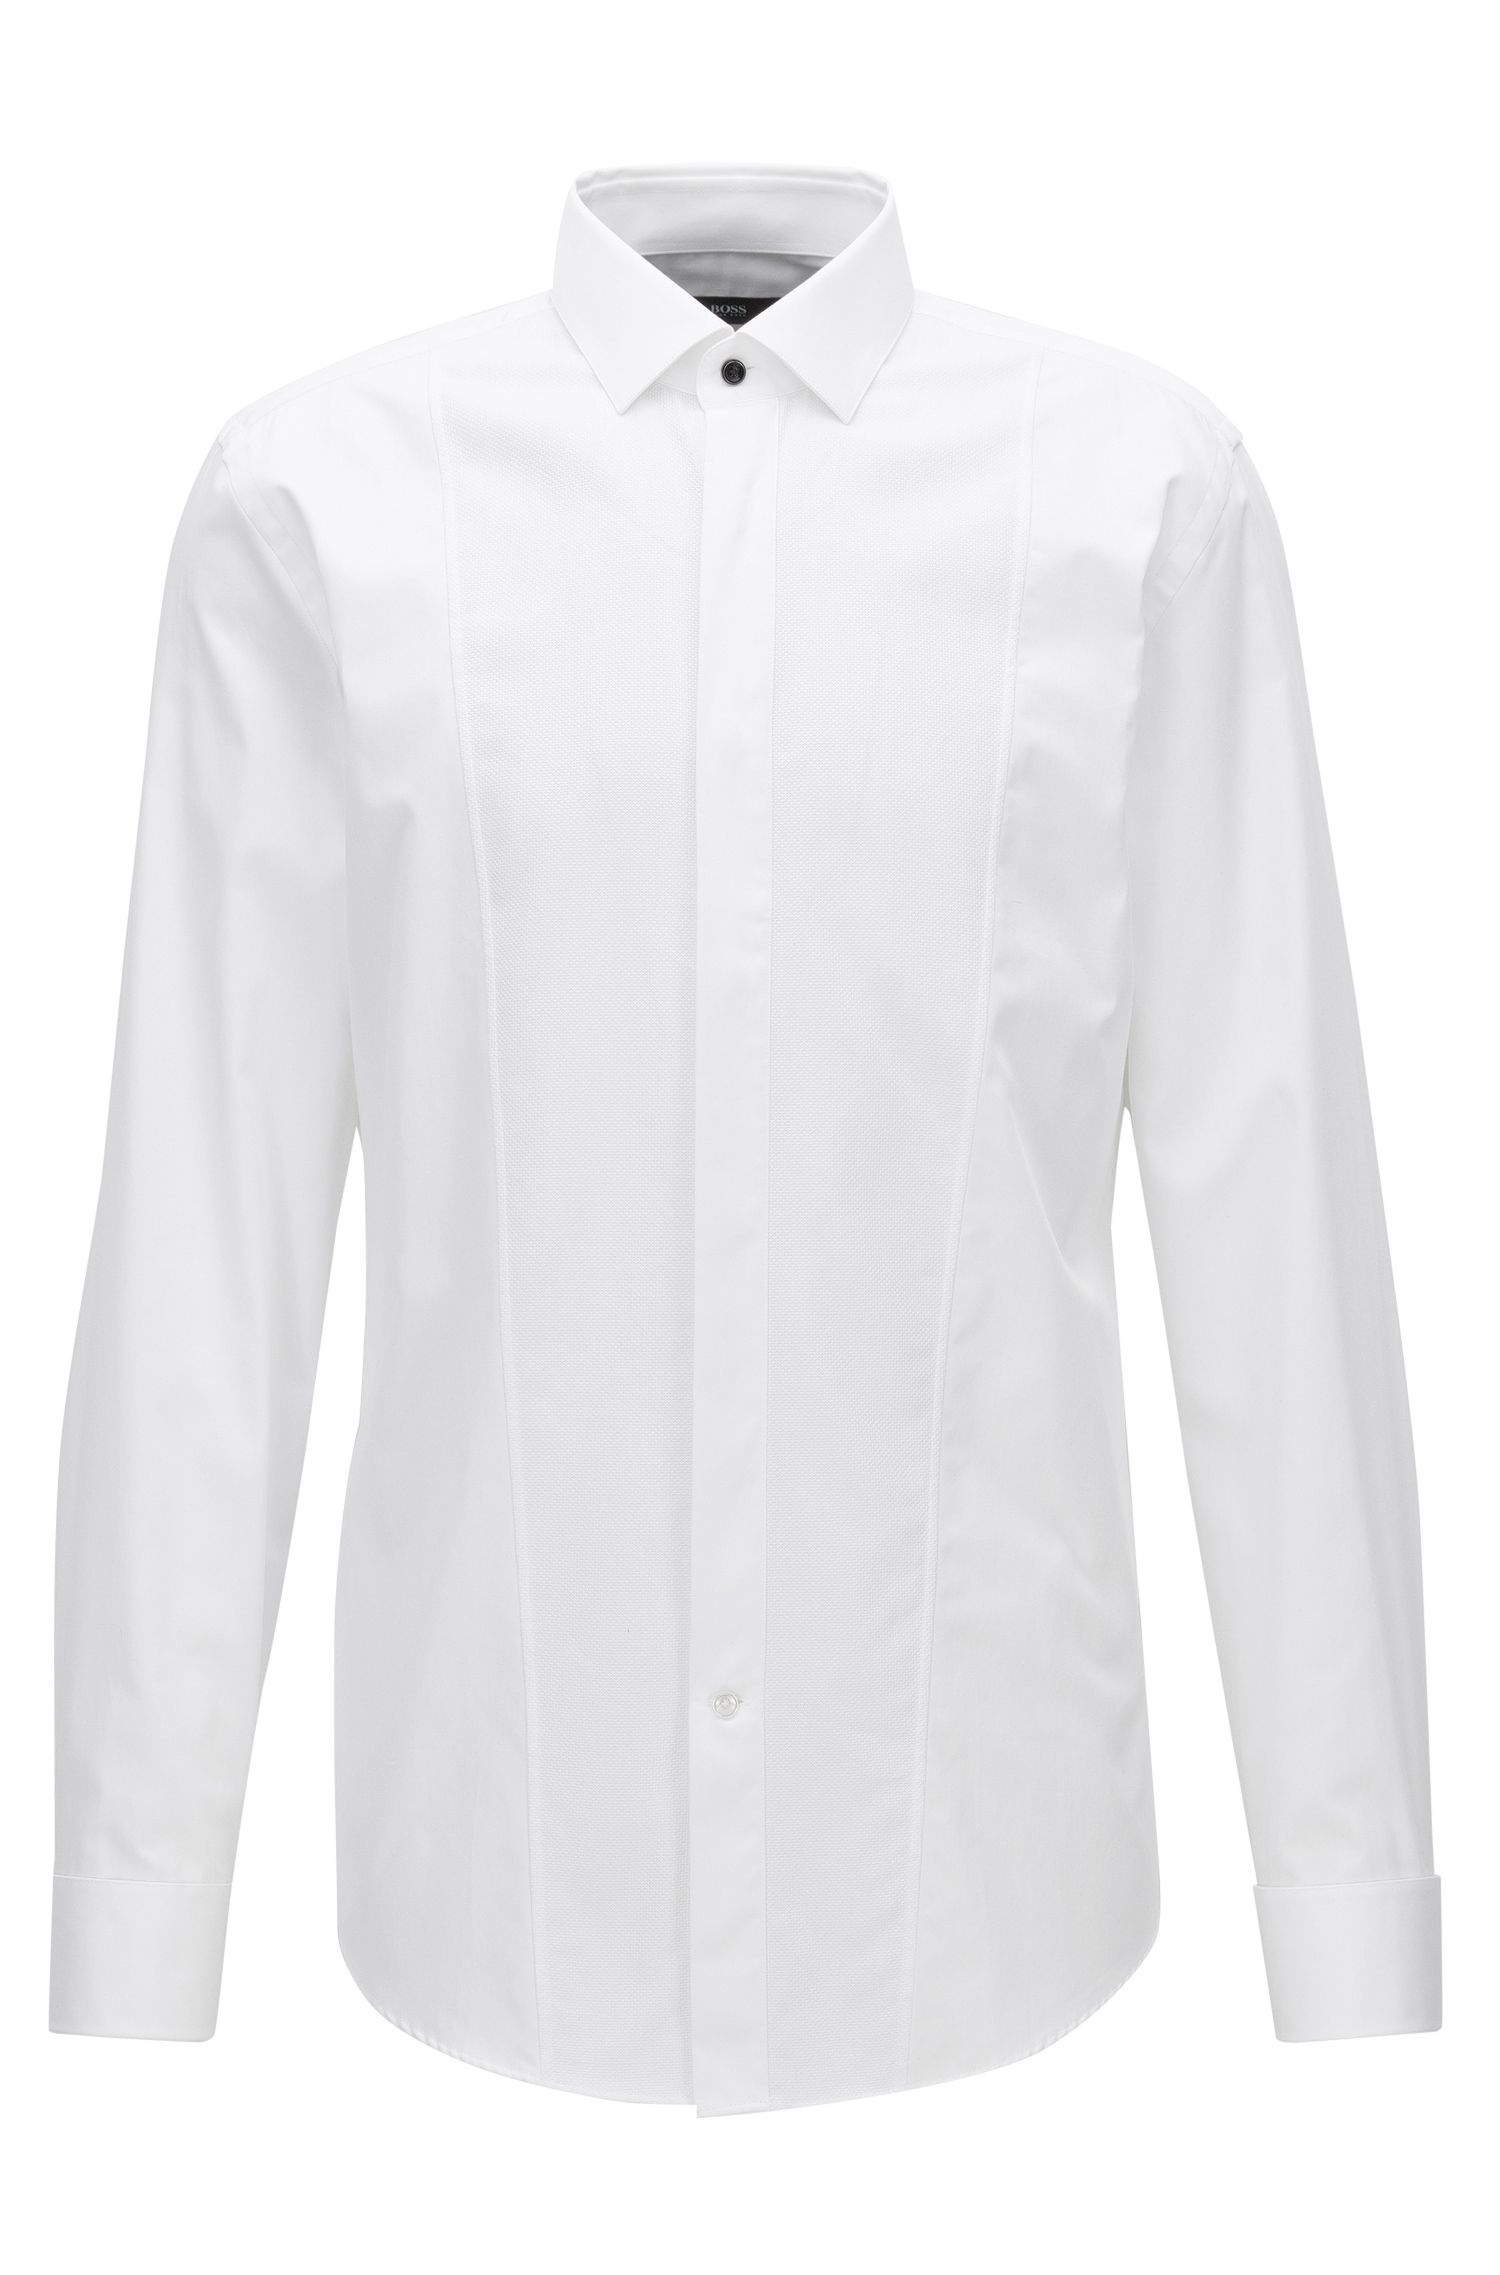 Dobby Bib Tuxedo Shirt, Slim Fit   Jarome